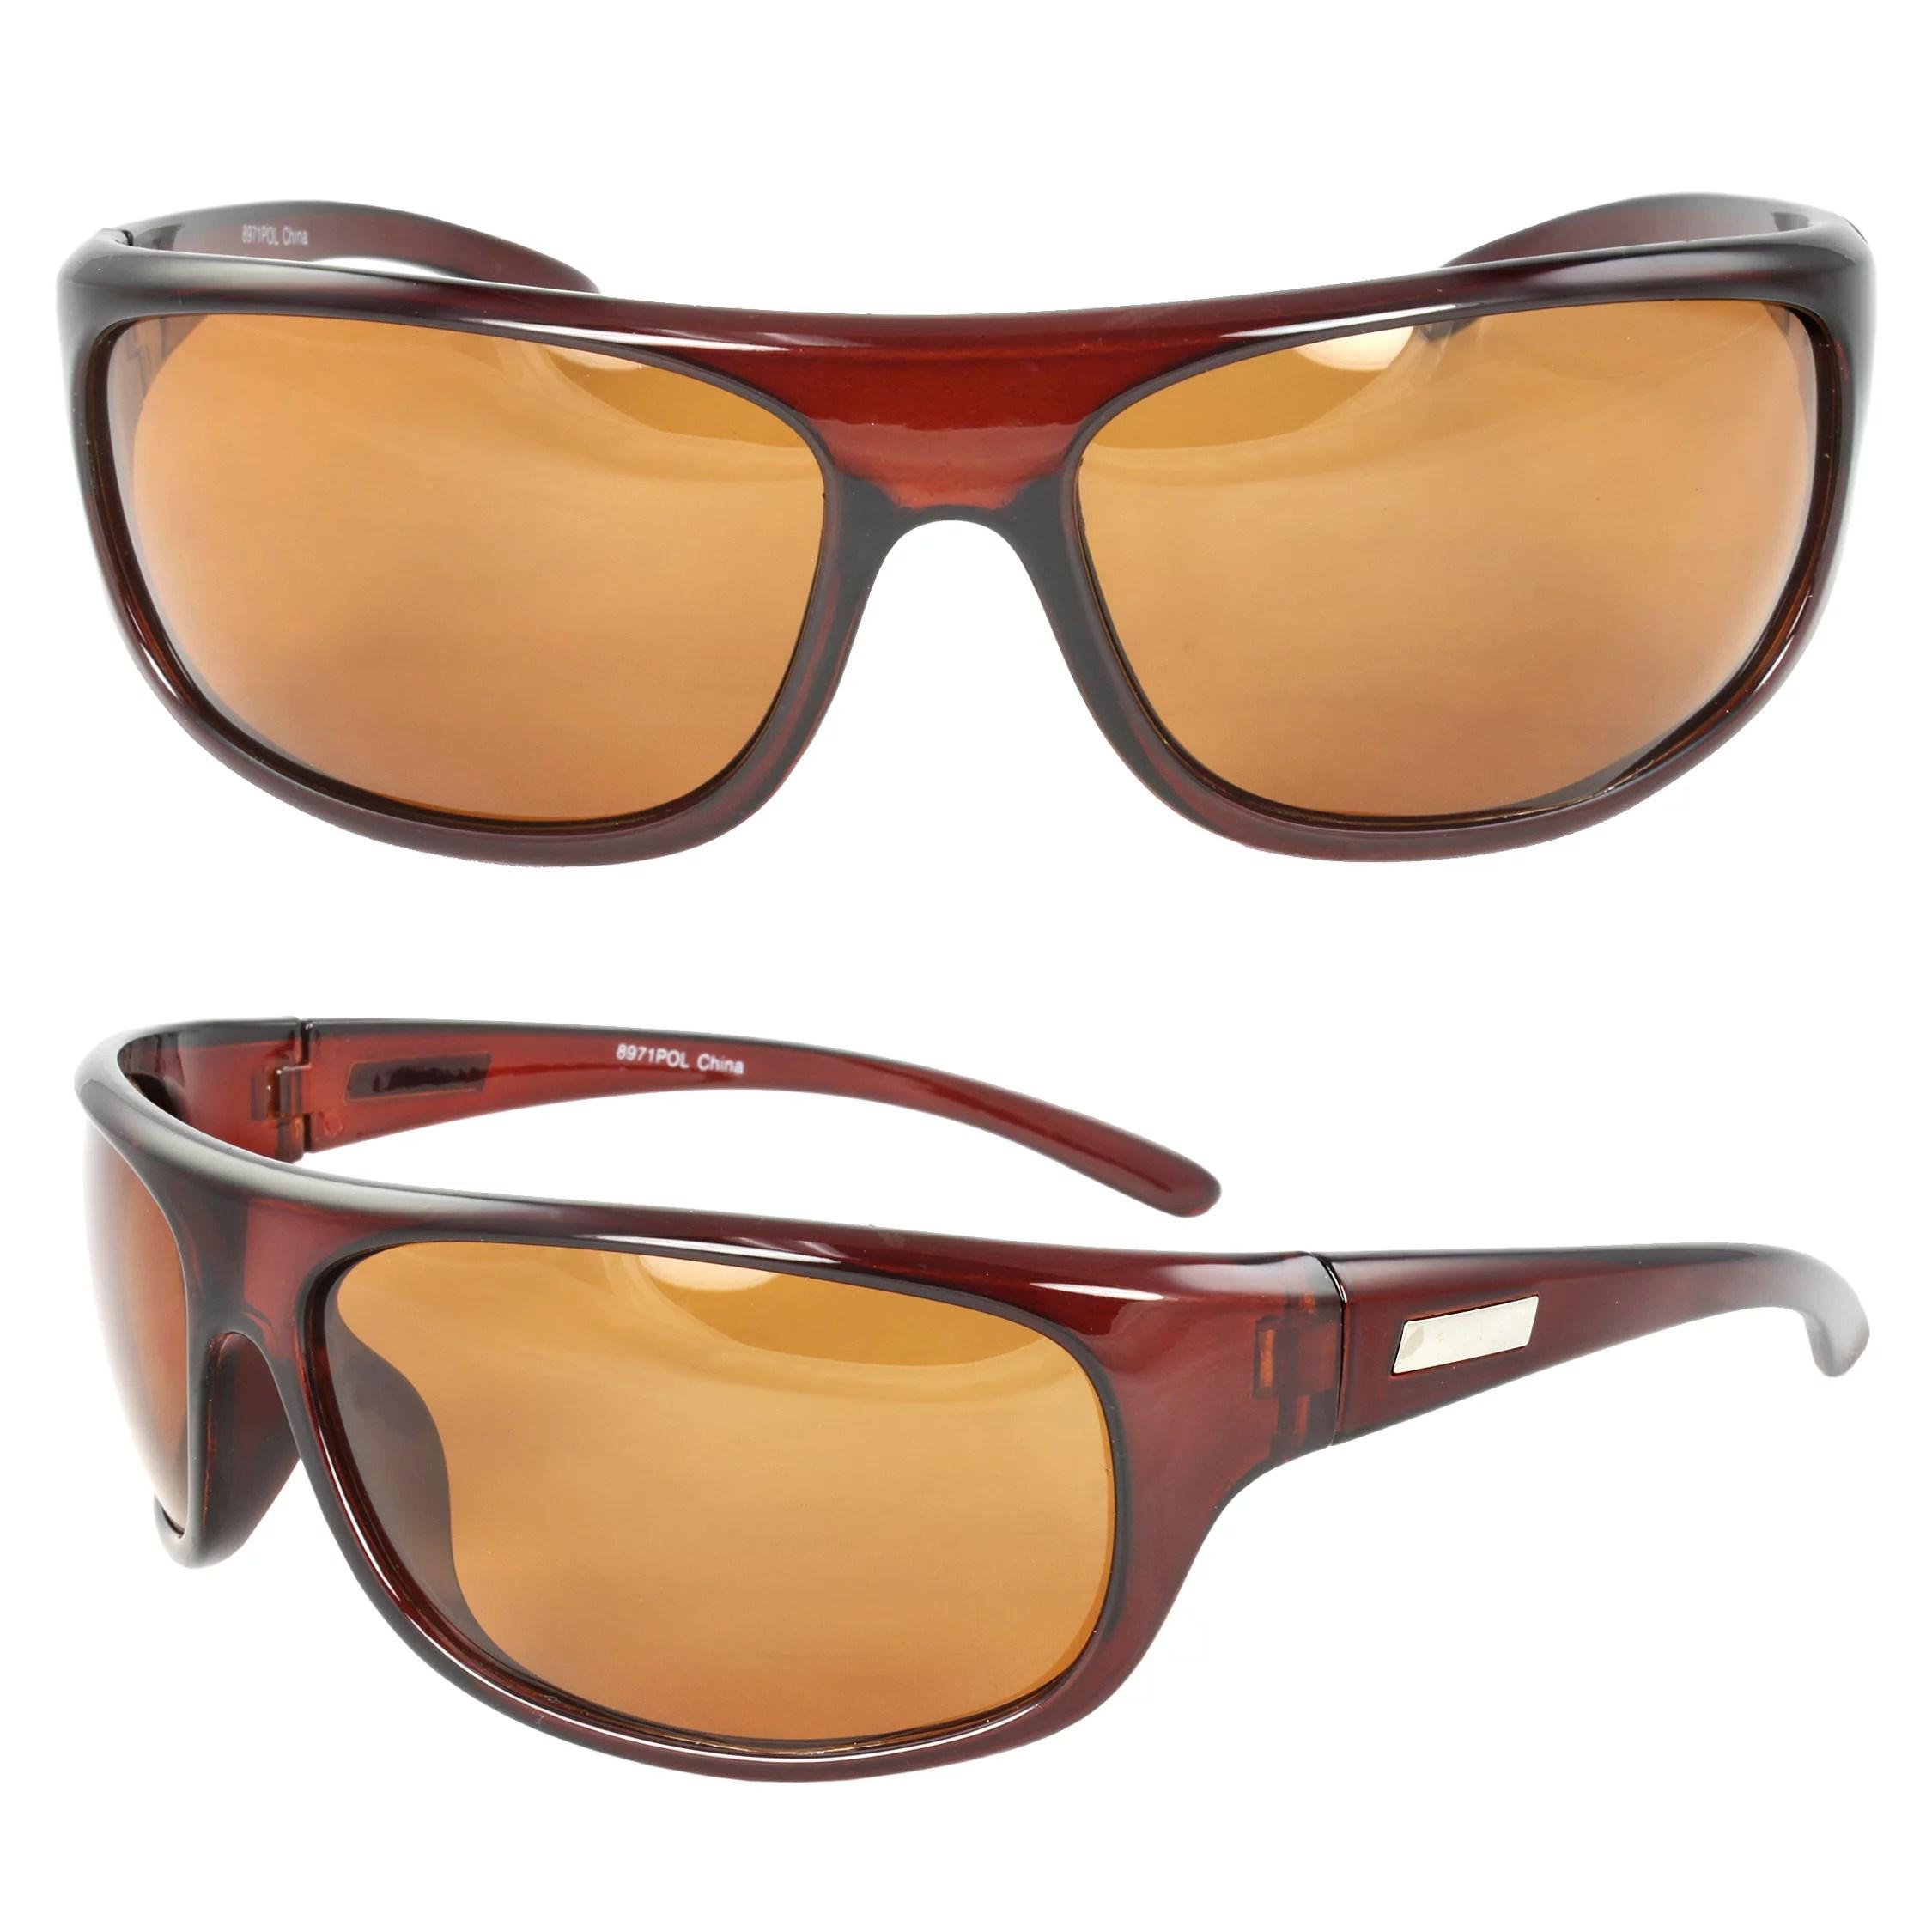 MLC Eyewear - Polarized Wrap Around Fashion Sunglasses ...